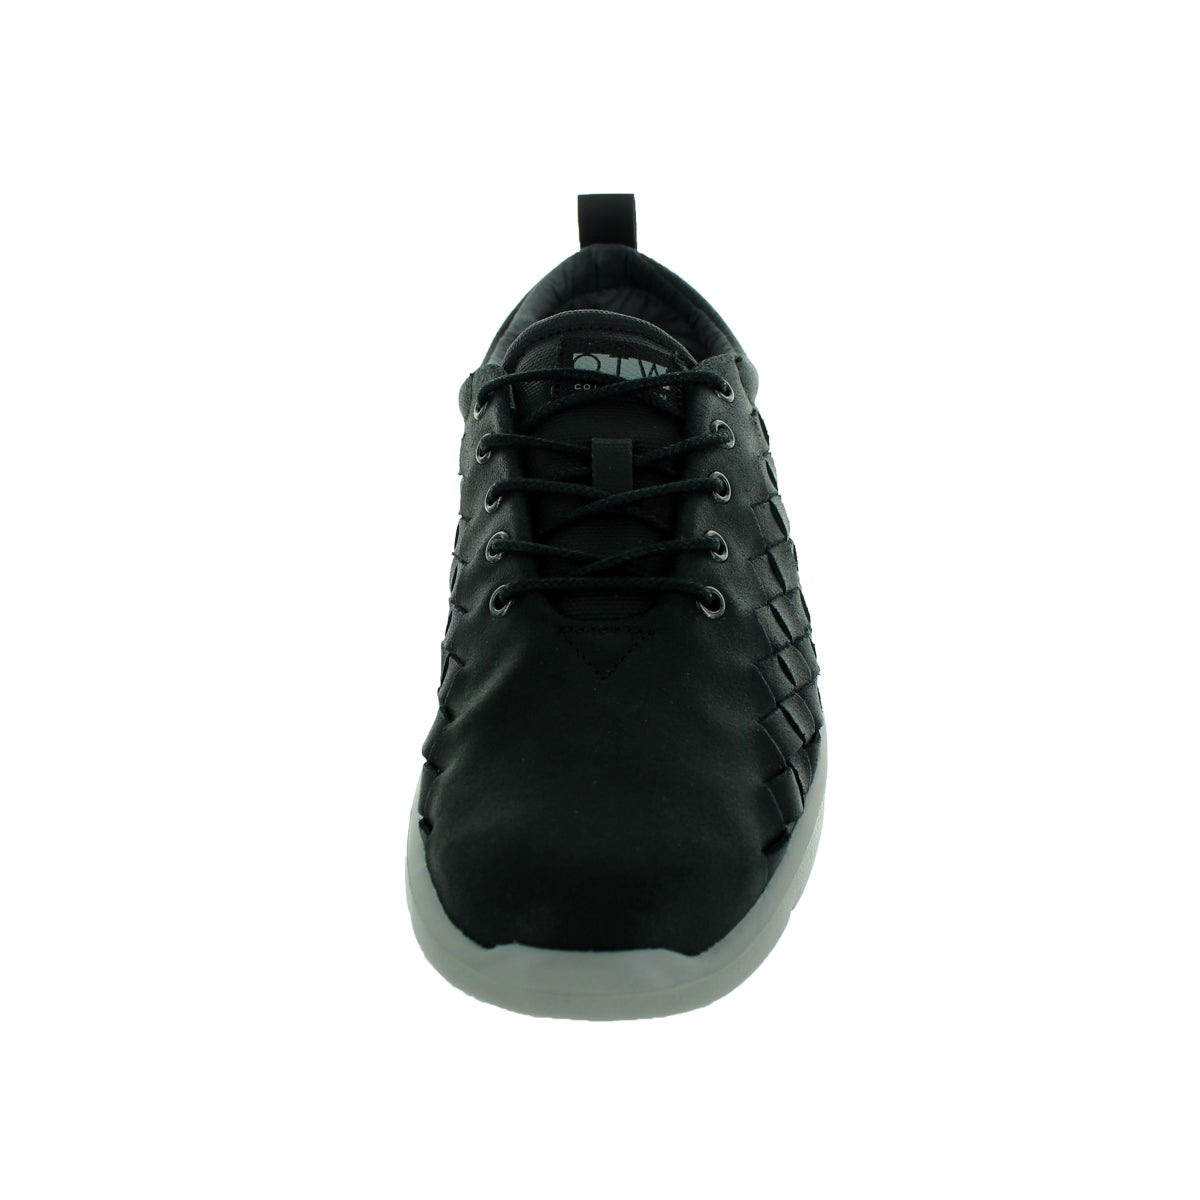 951d70d7fe Shop Vans Men s Tesella Bomber Black Ice Grey Skate Shoe - Free Shipping  Today - Overstock.com - 12115265